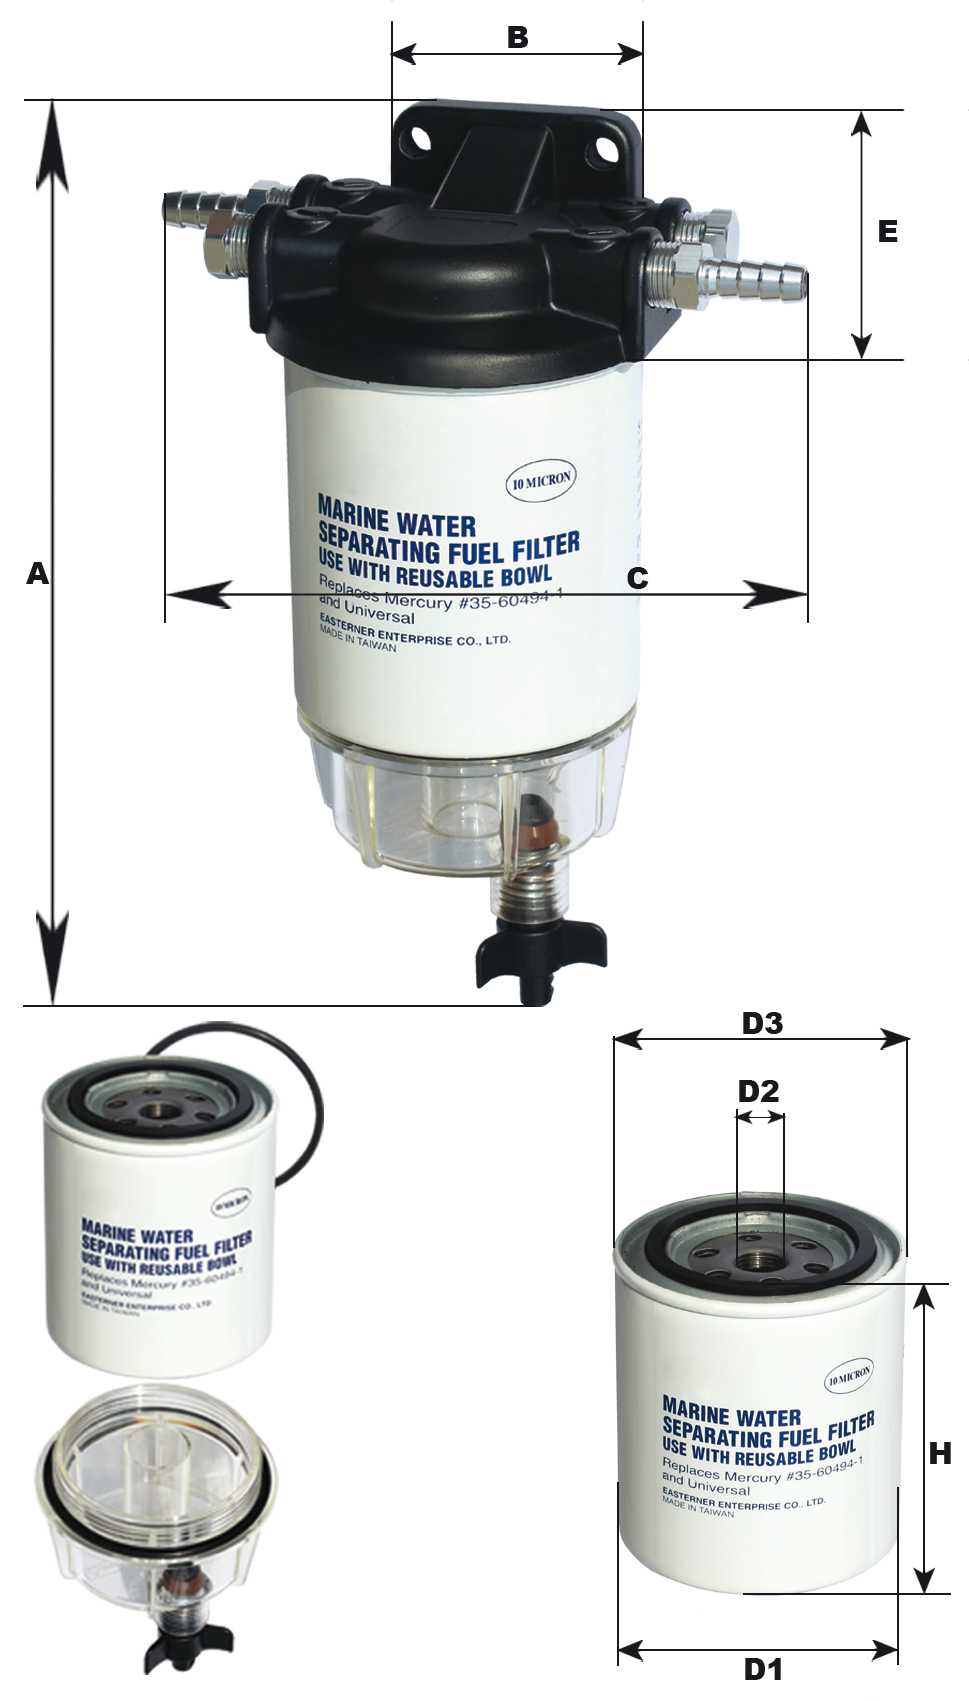 Fuel Filter Gfn Gibellato Forniture Nautiche Yamaha 10 Micron